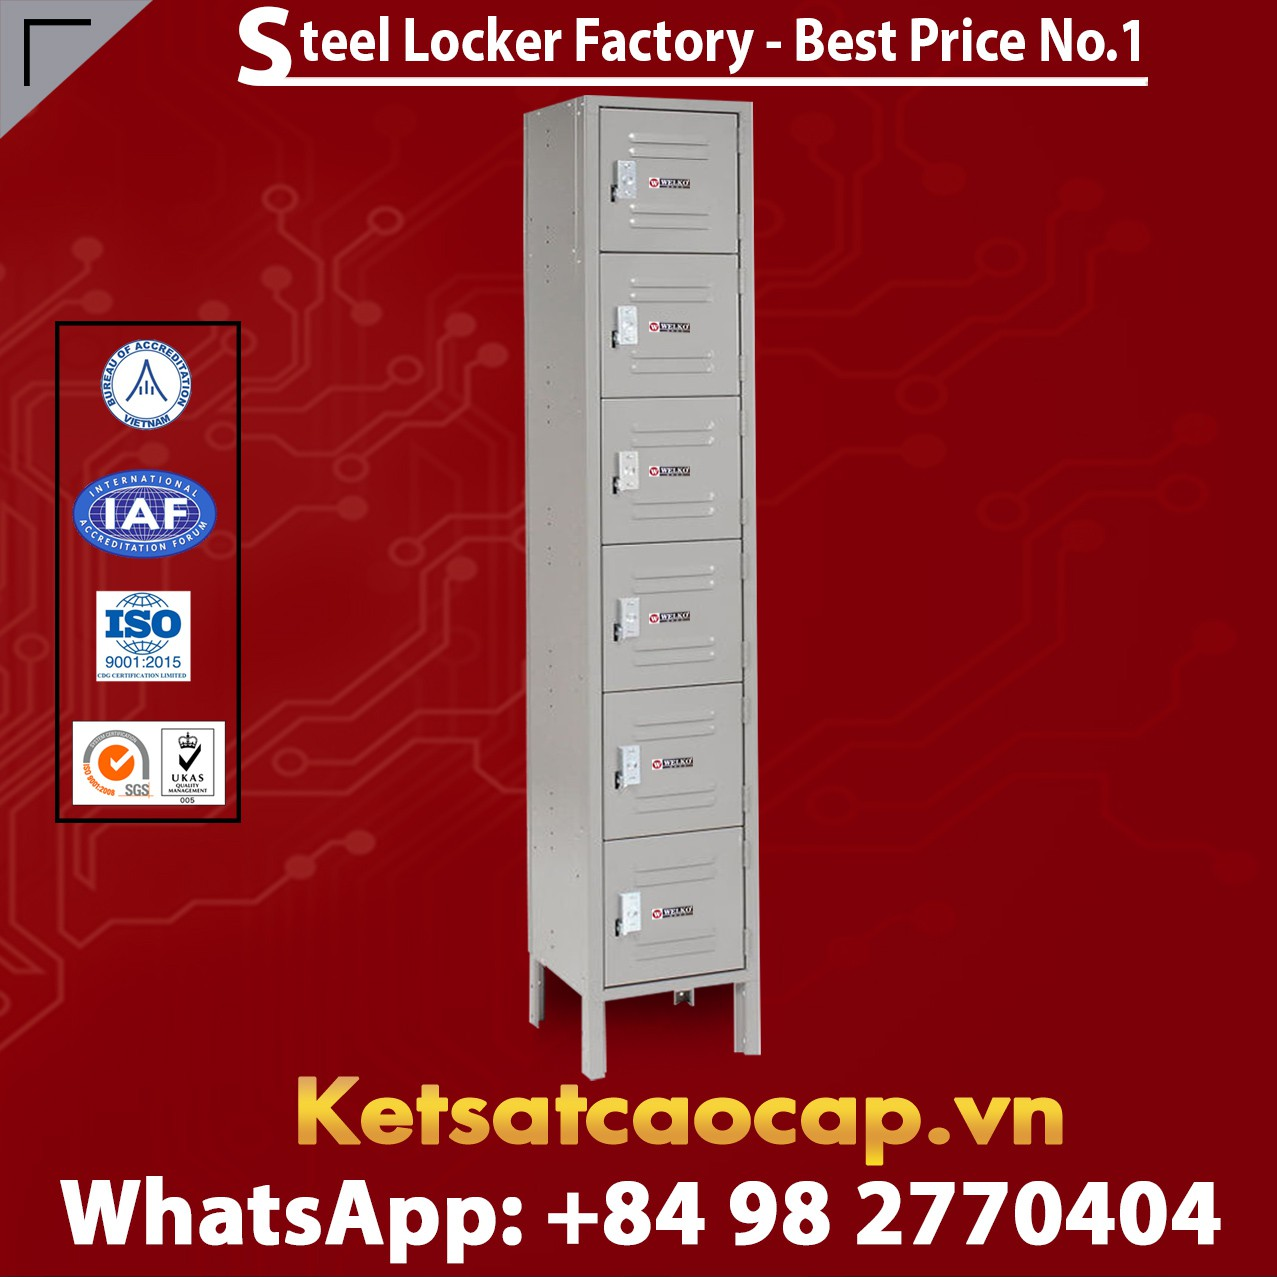 Steel Locker 6 Tier 12 x 12 x 12 6 Door Ready To Assemble Gray